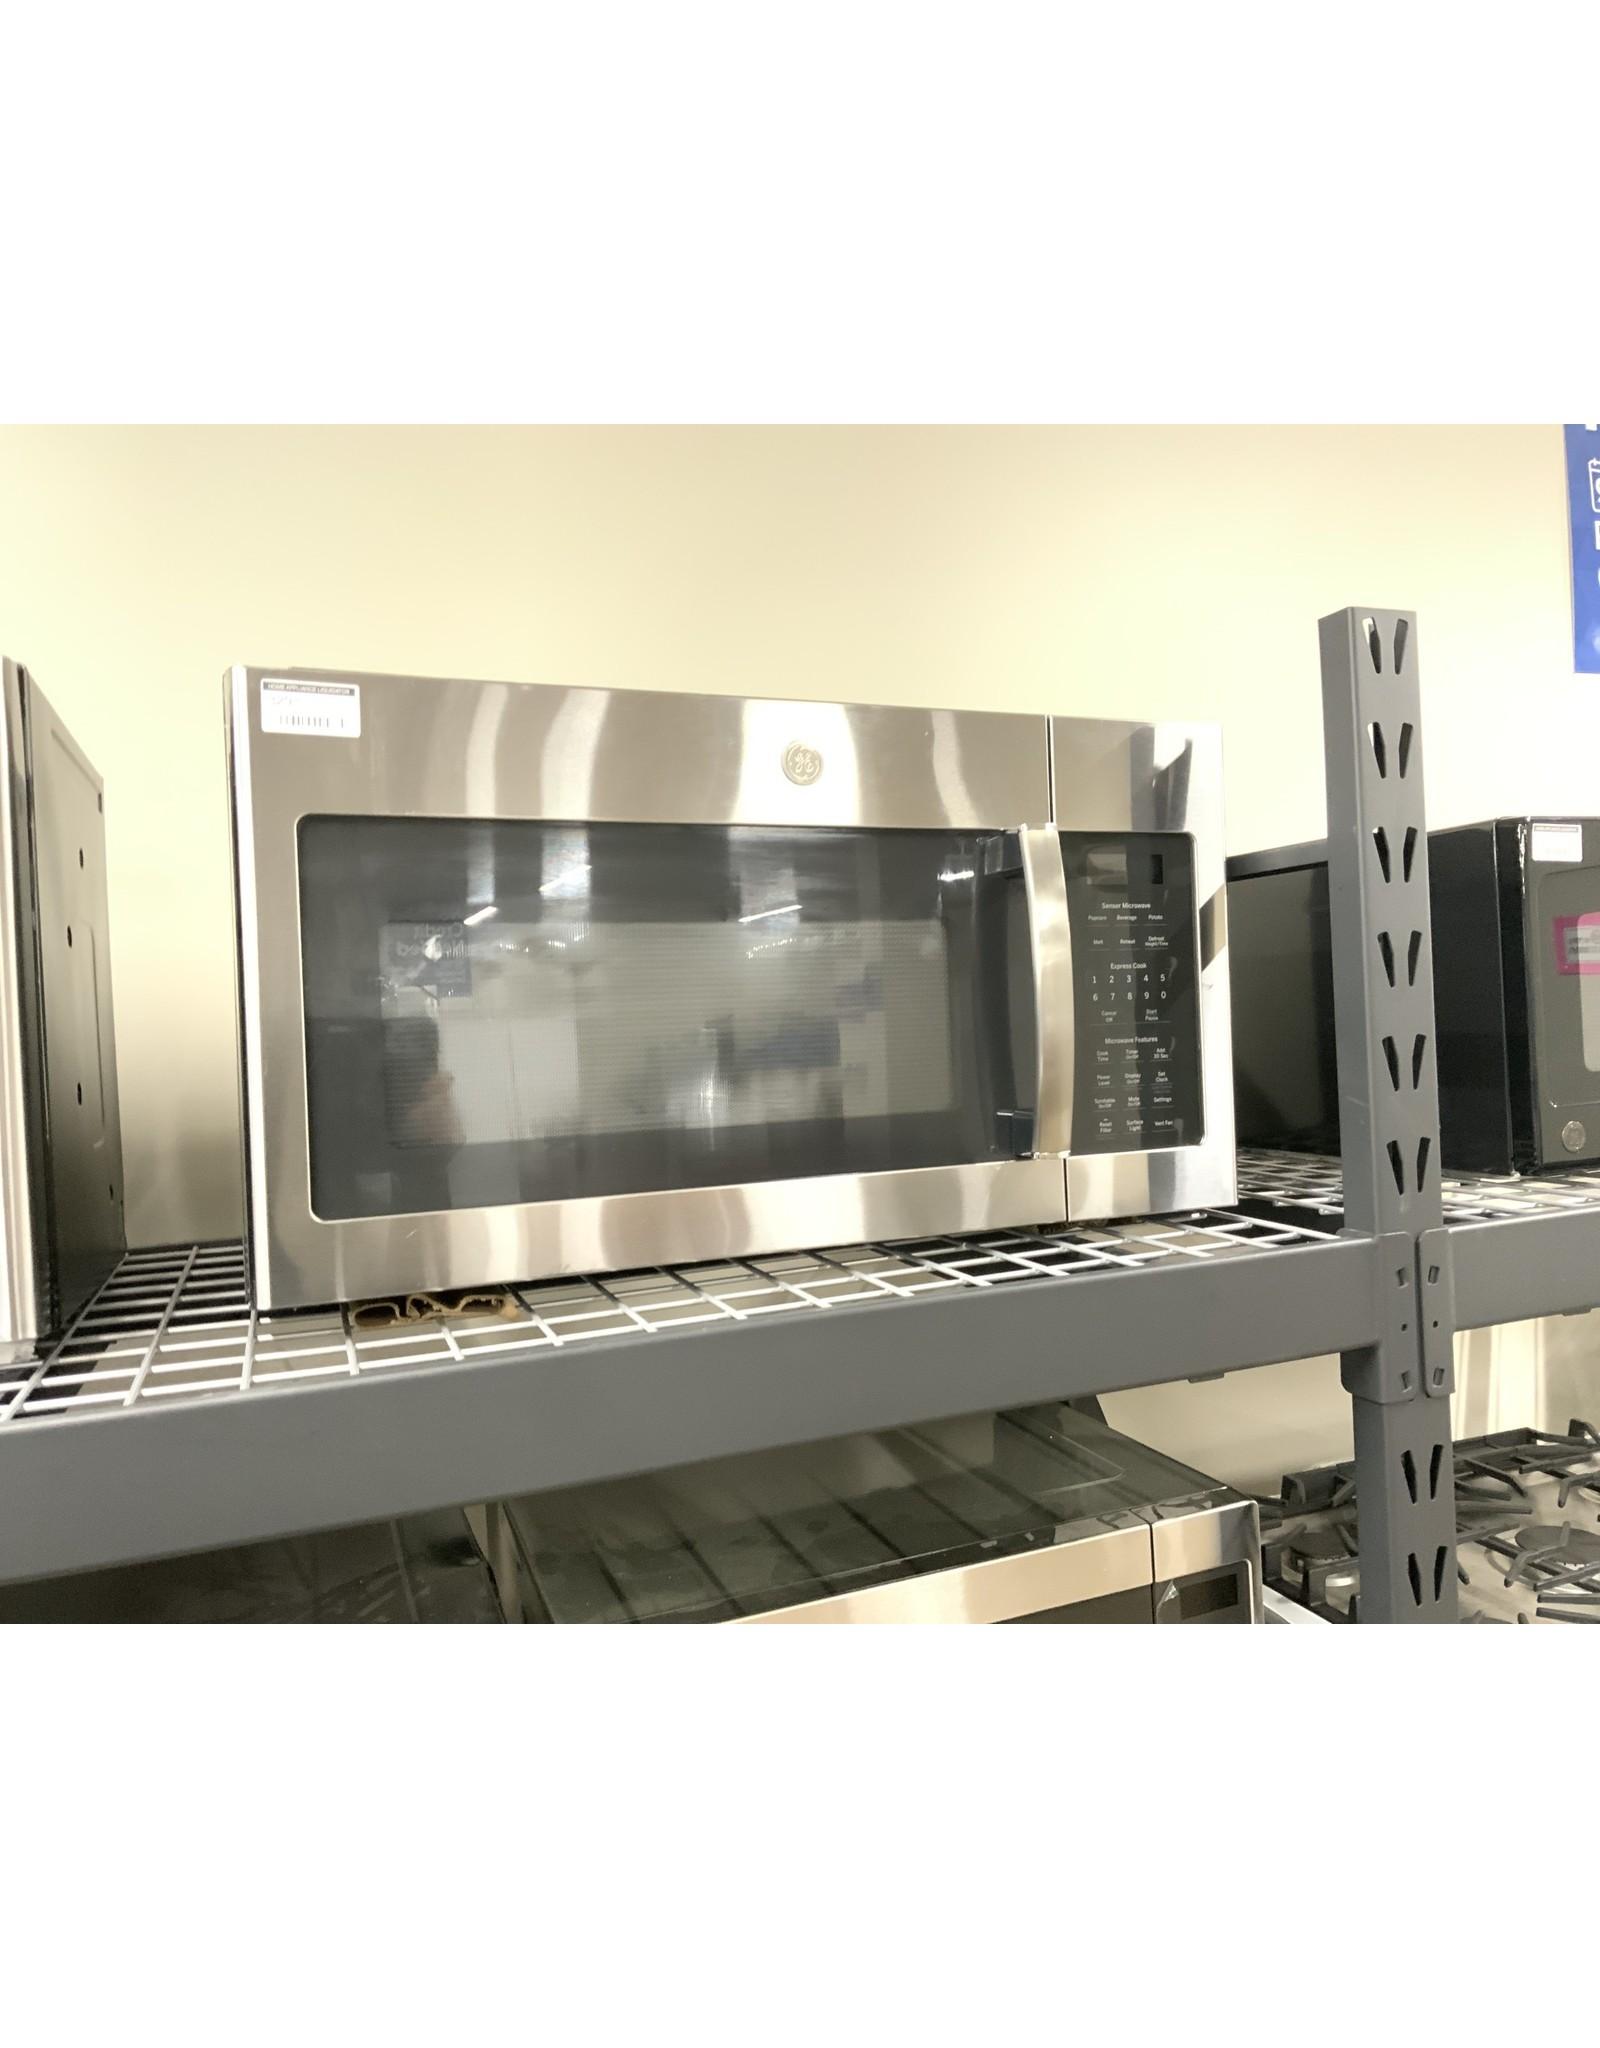 ge ge 1 7 cu ft over the range sensor microwave oven